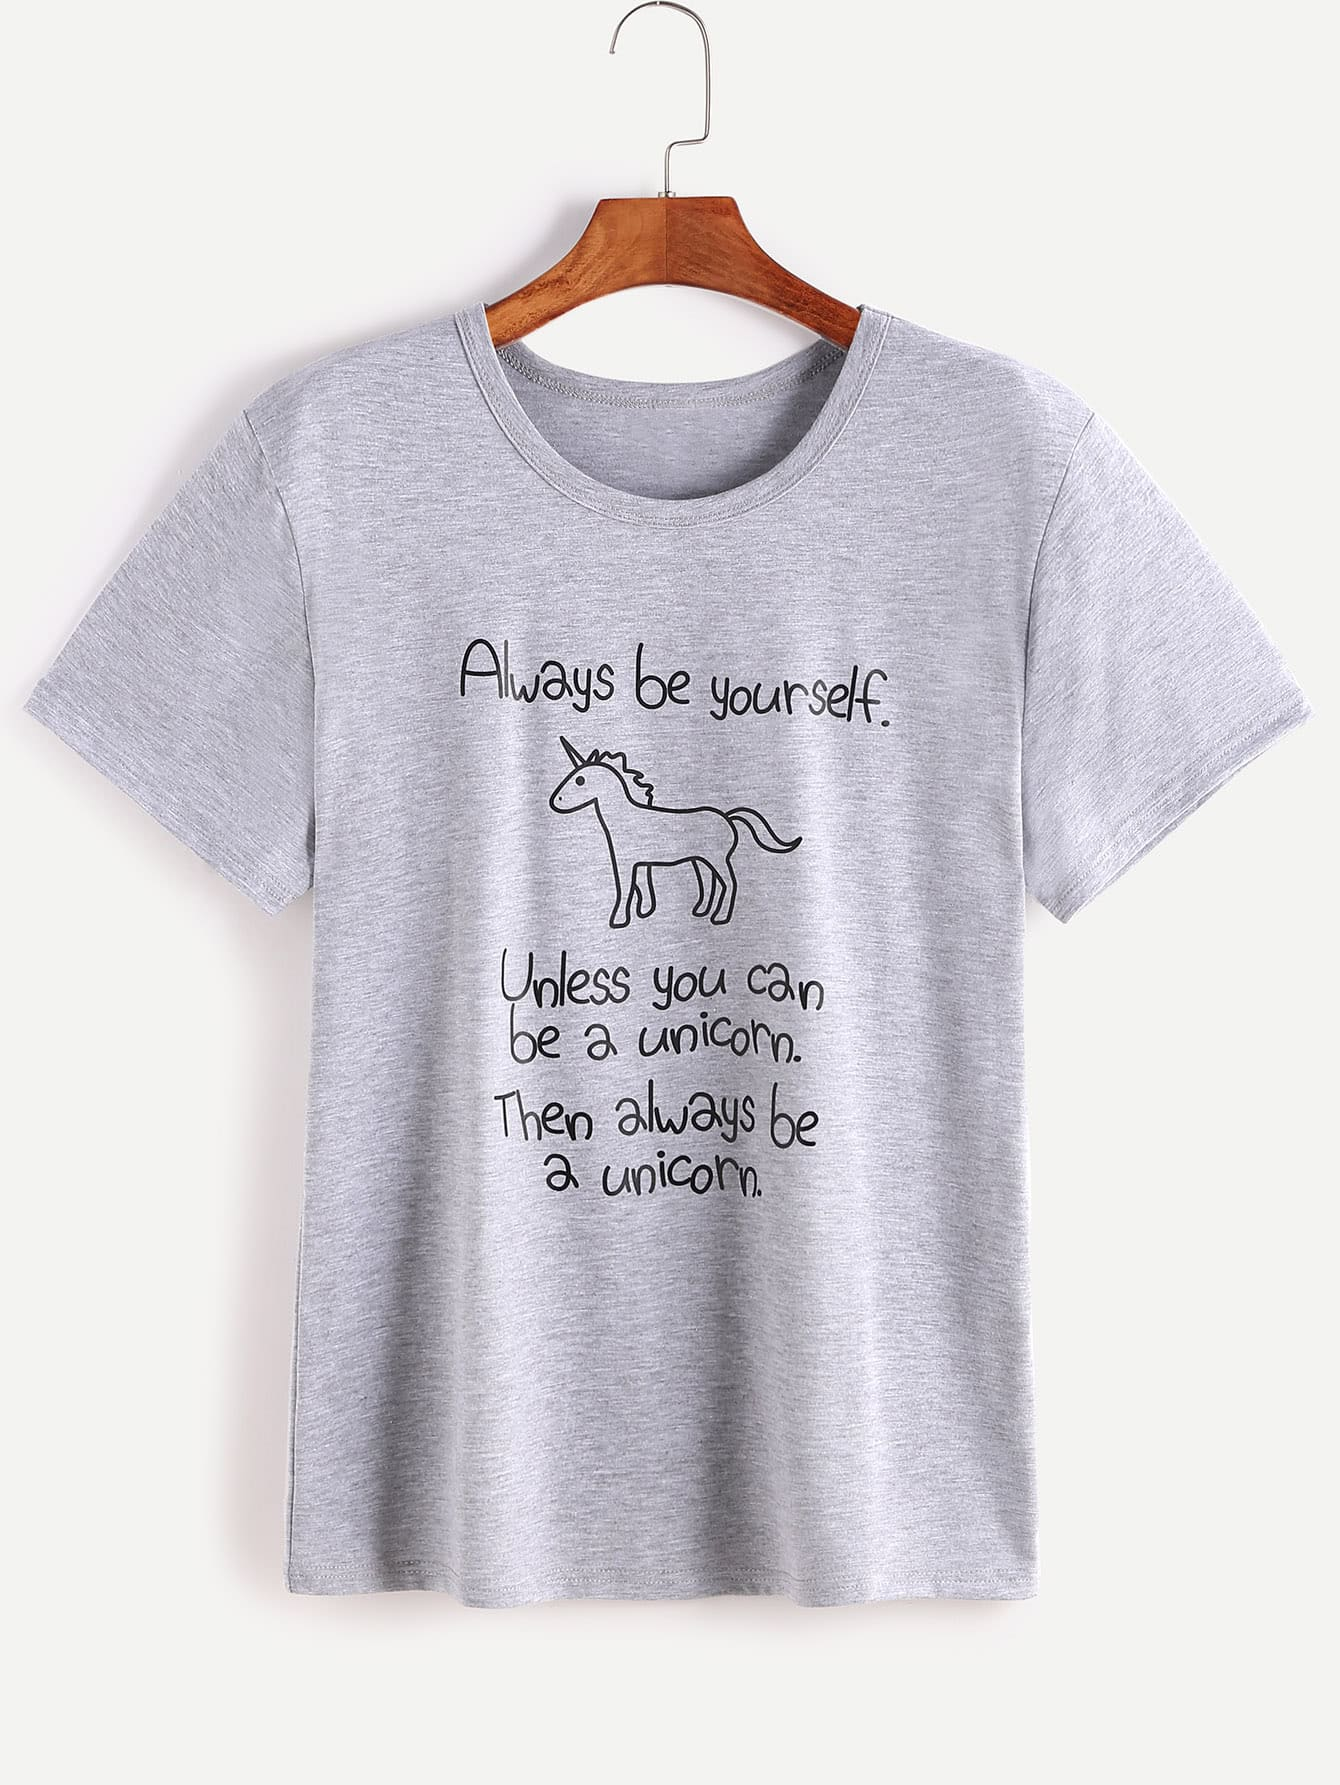 Heather Grey Slogan Print Short Sleeve T-shirt